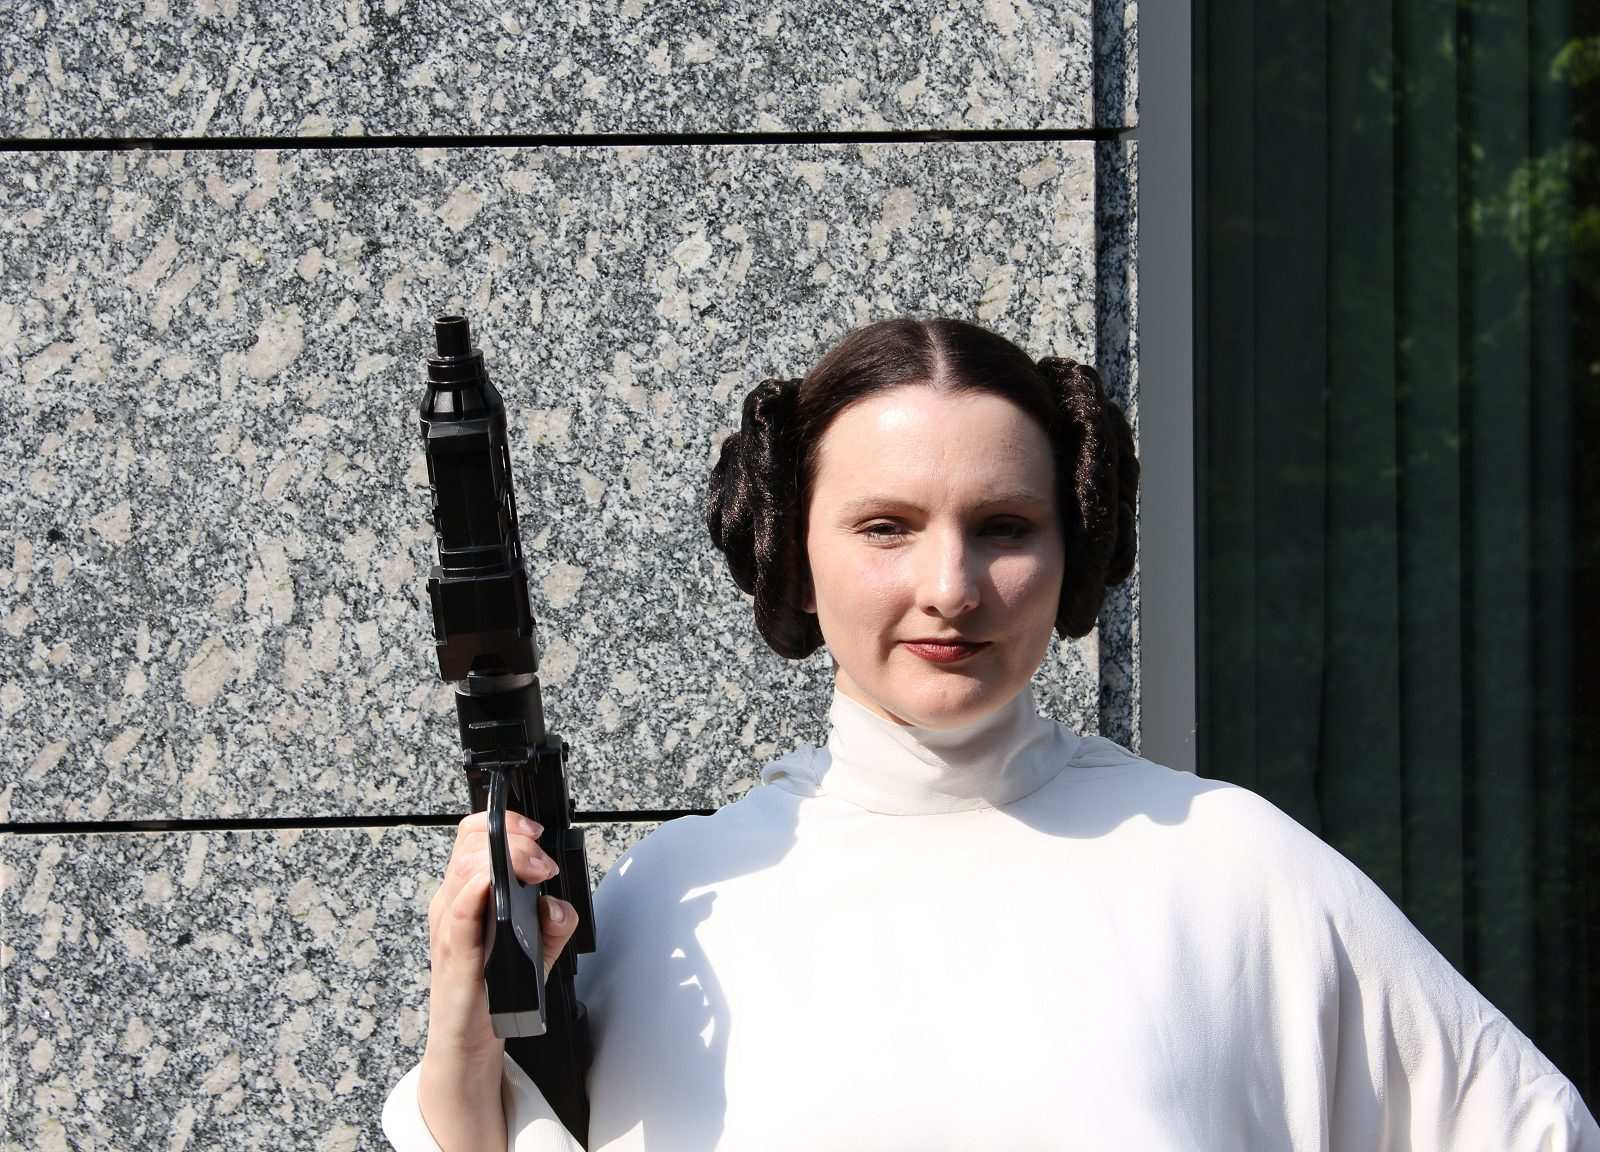 Leia senatorial_08